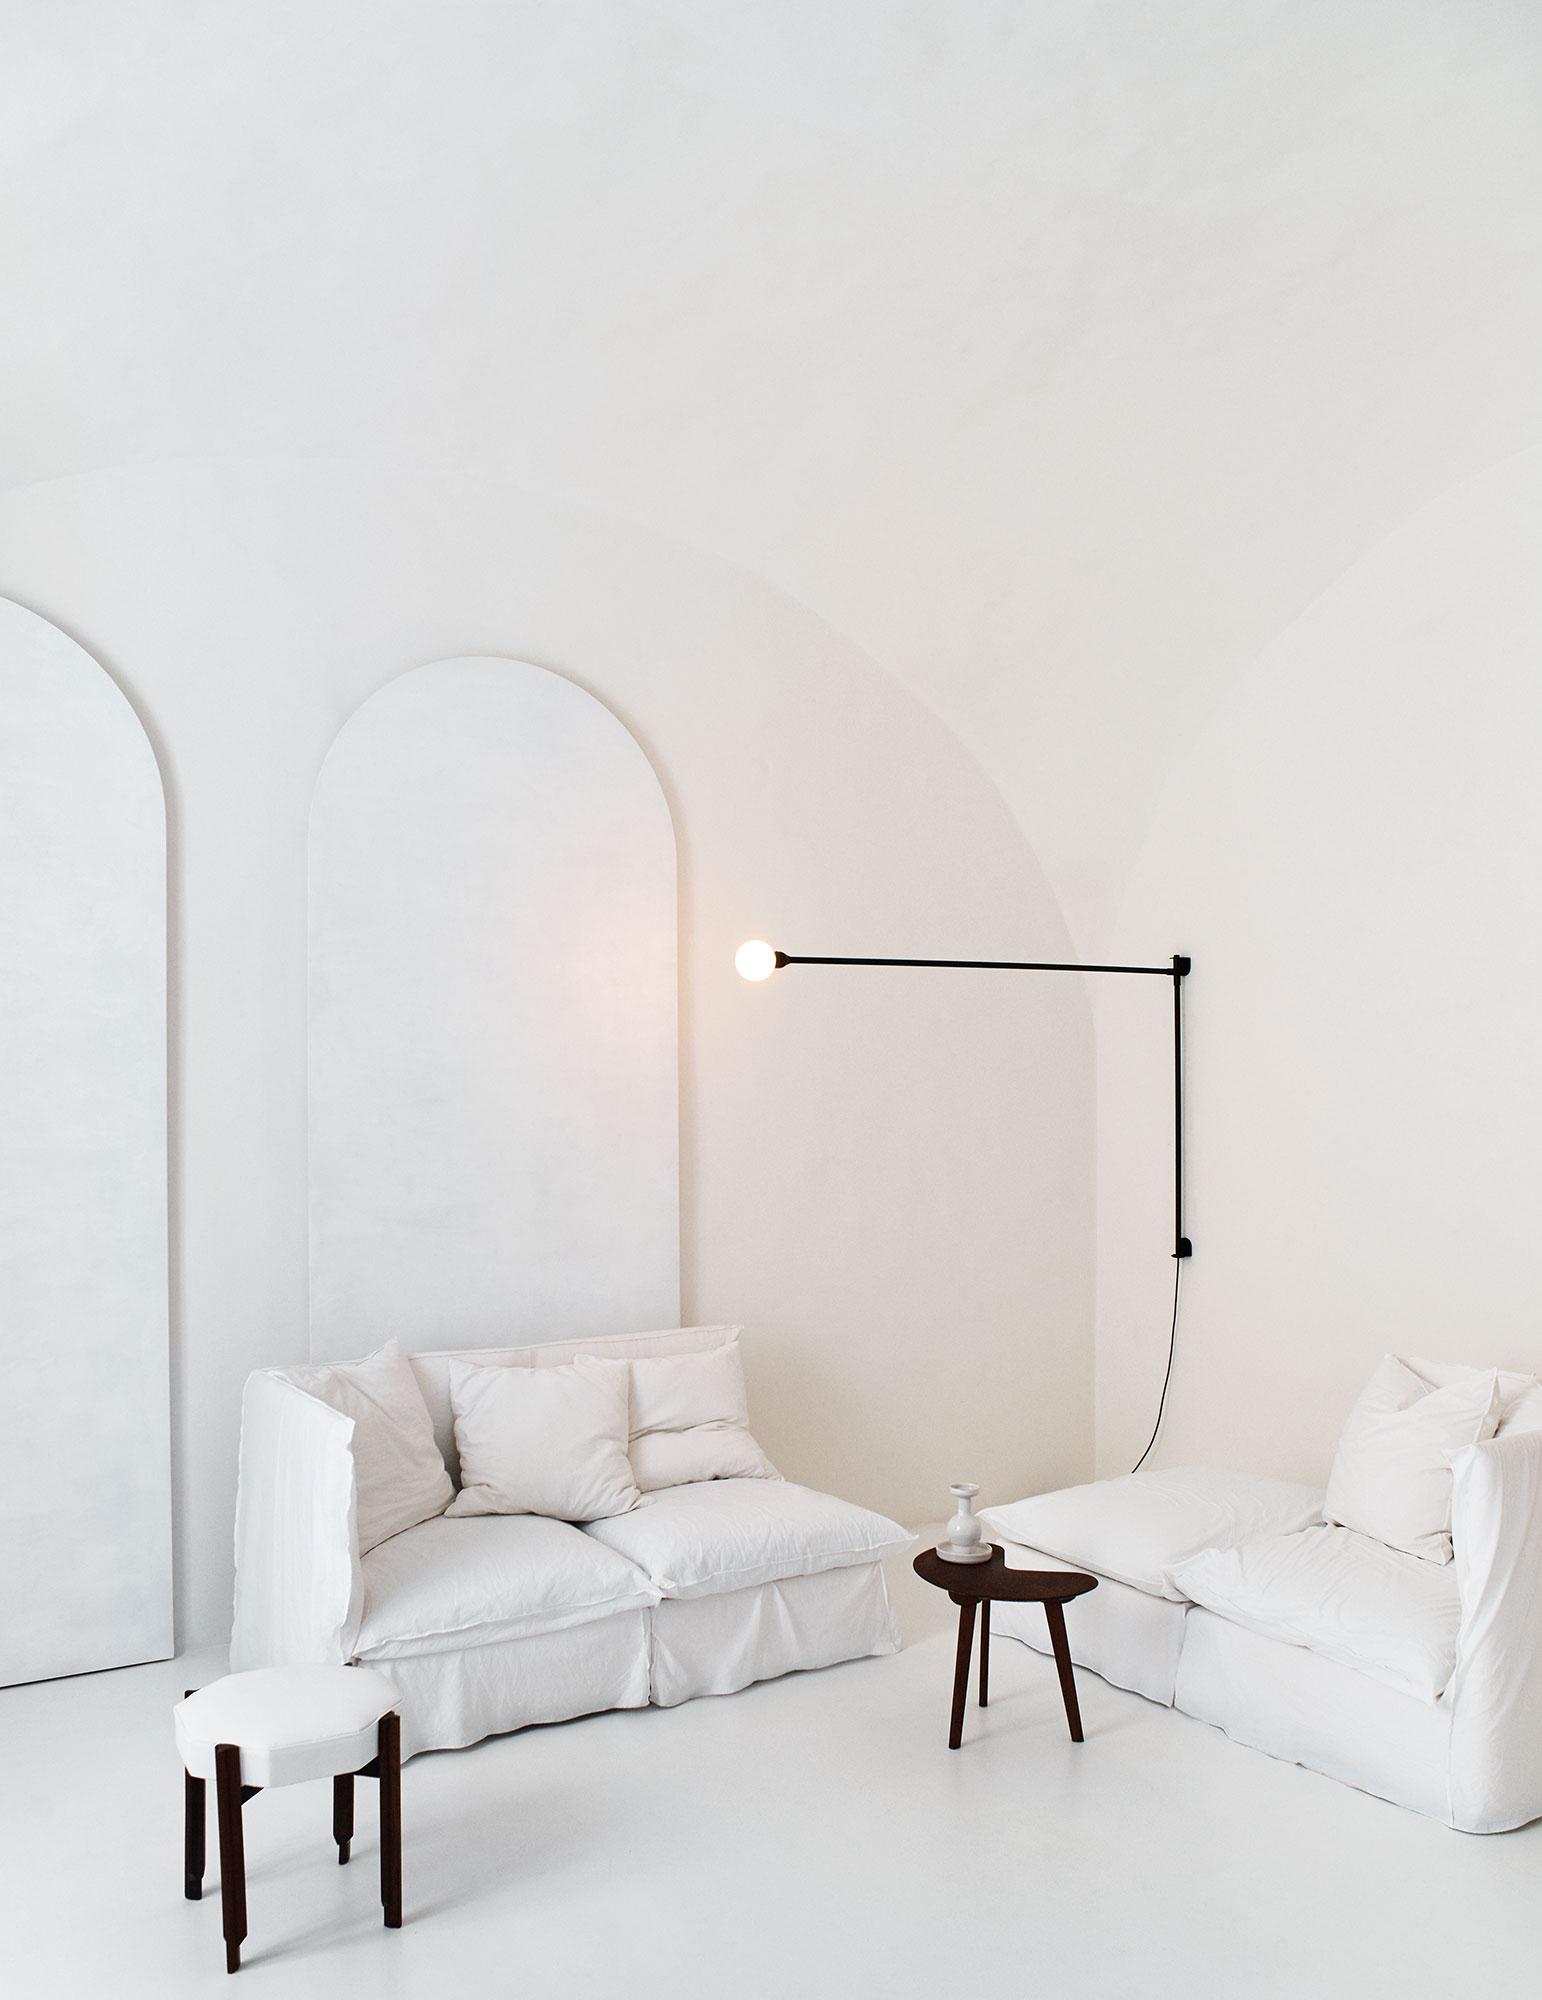 "Elle Decor July 2018 ""Bianco assoluto"" | Andrea Ferrari | Mango | Elle Decor | Nicolò Andreoni | Numerique Retouch Photo Retouching Studio"